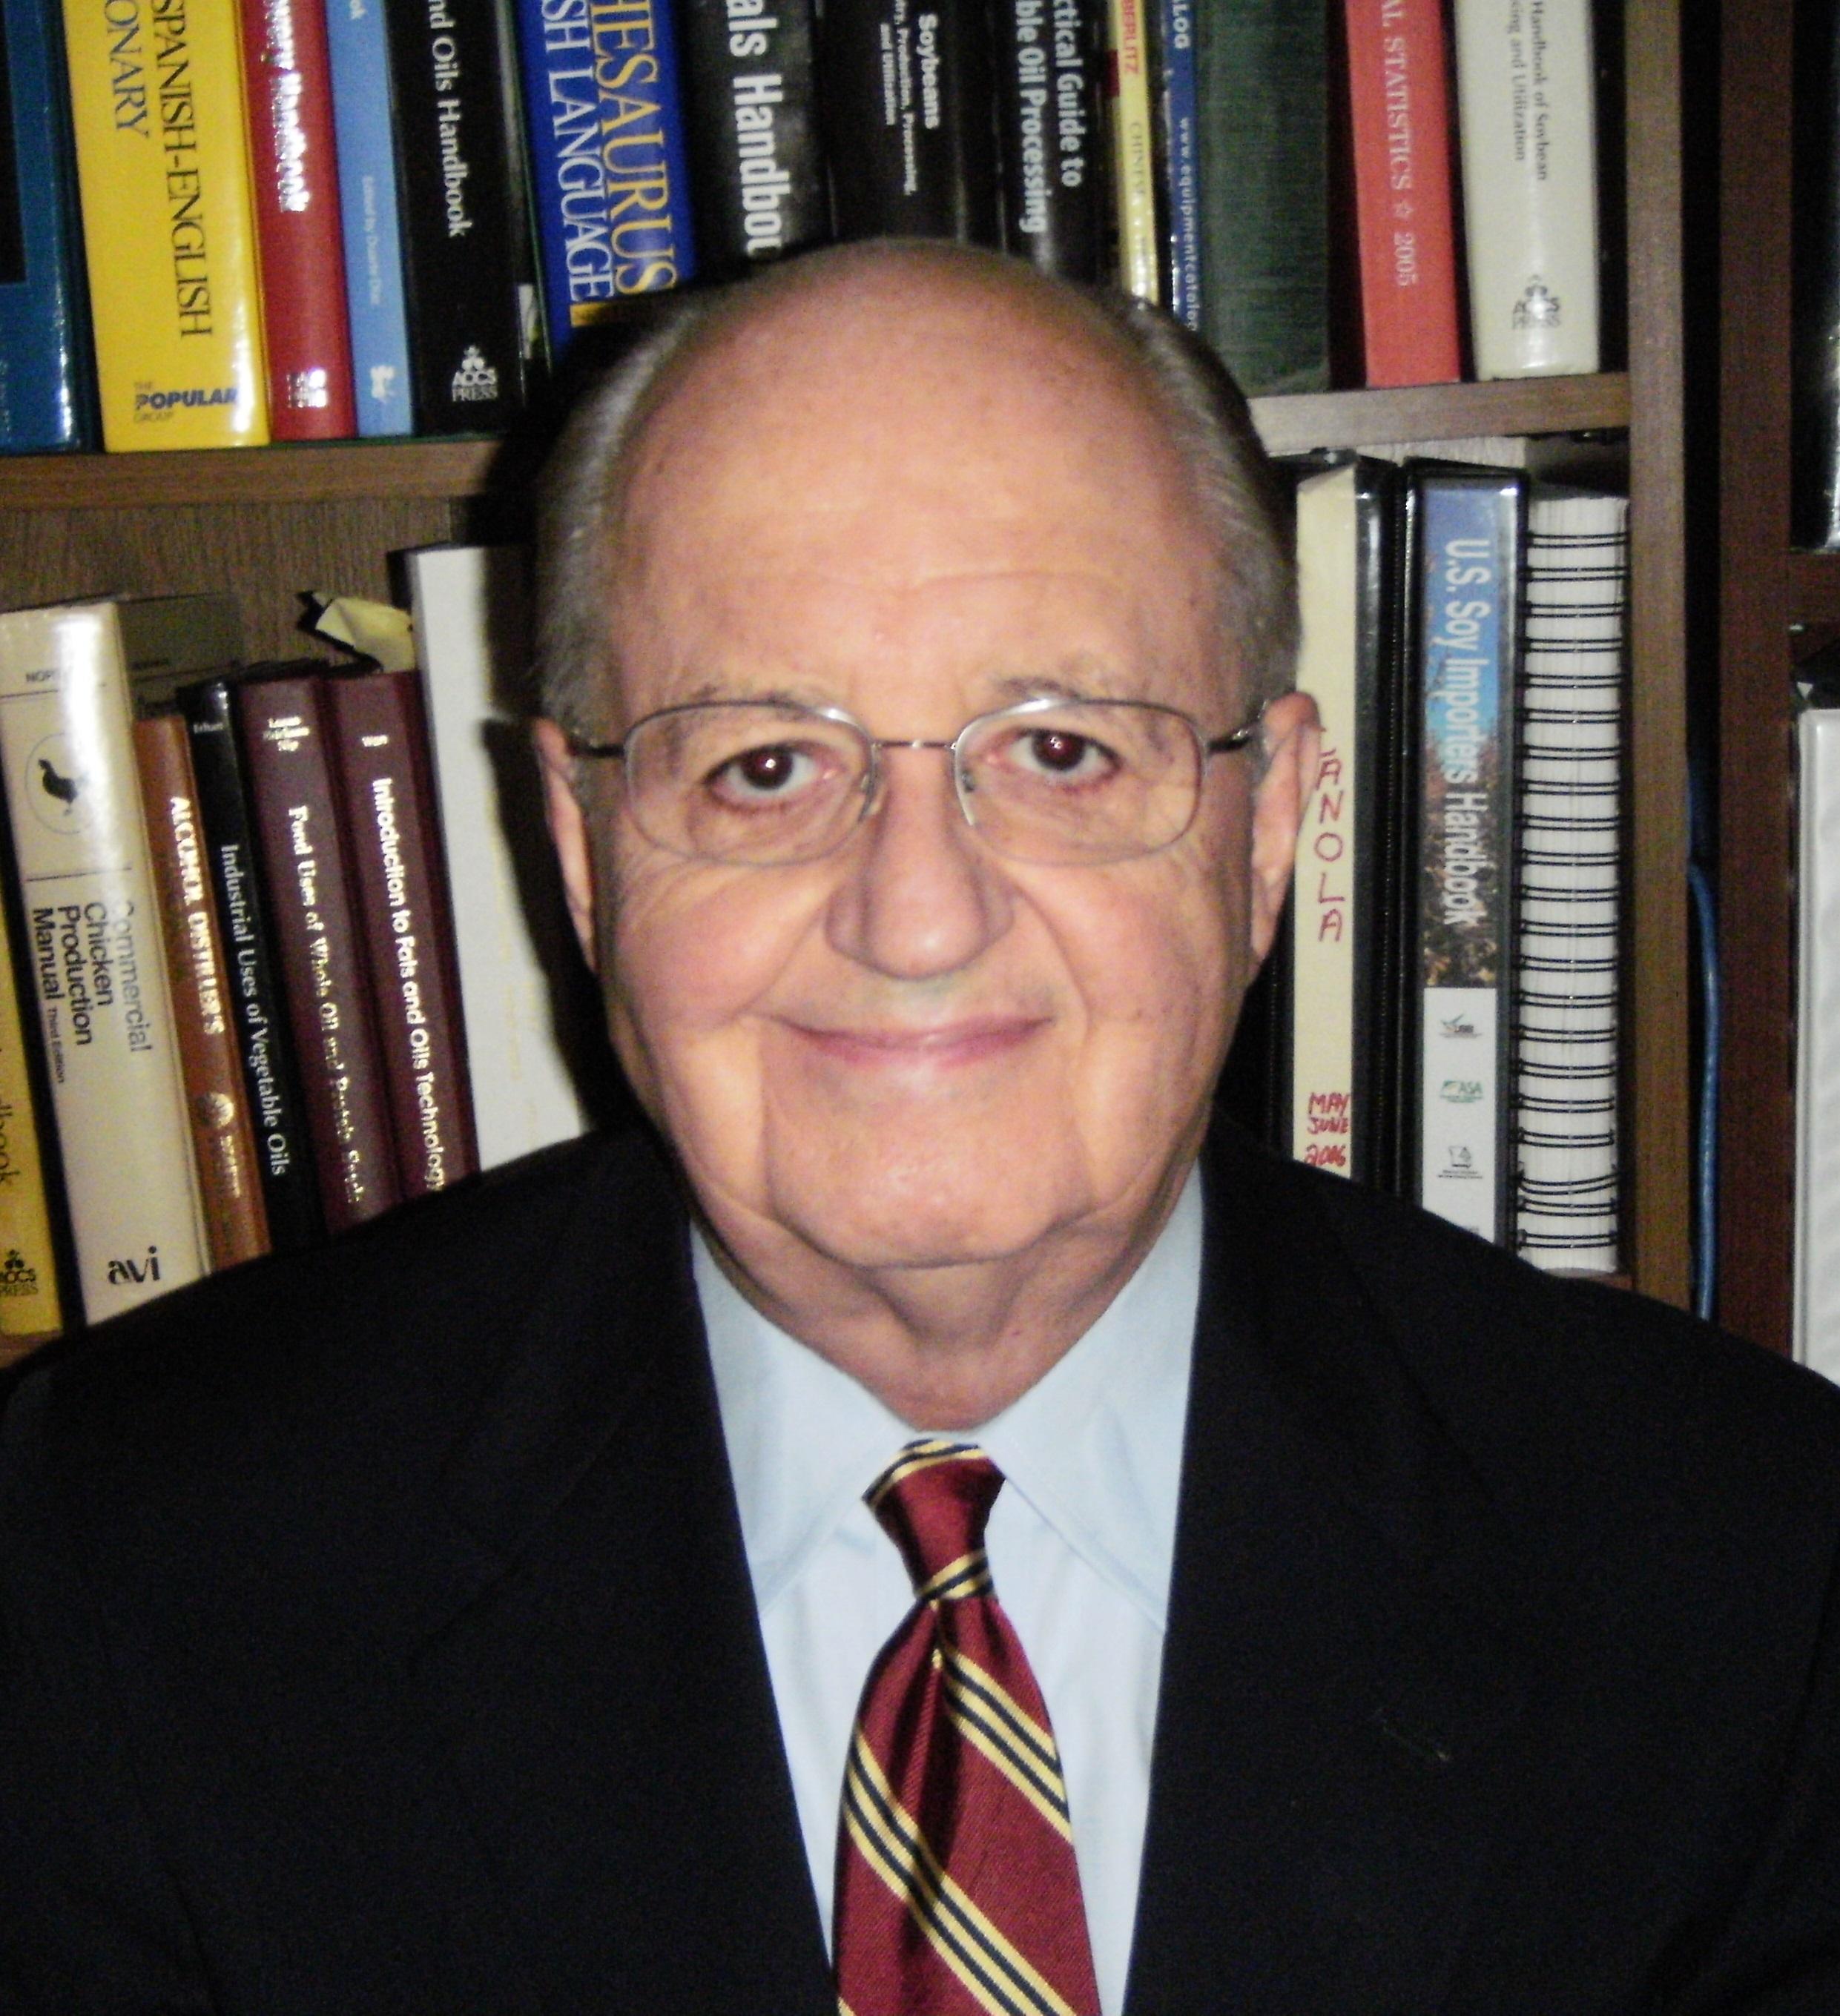 Robert L Stroup.JPG